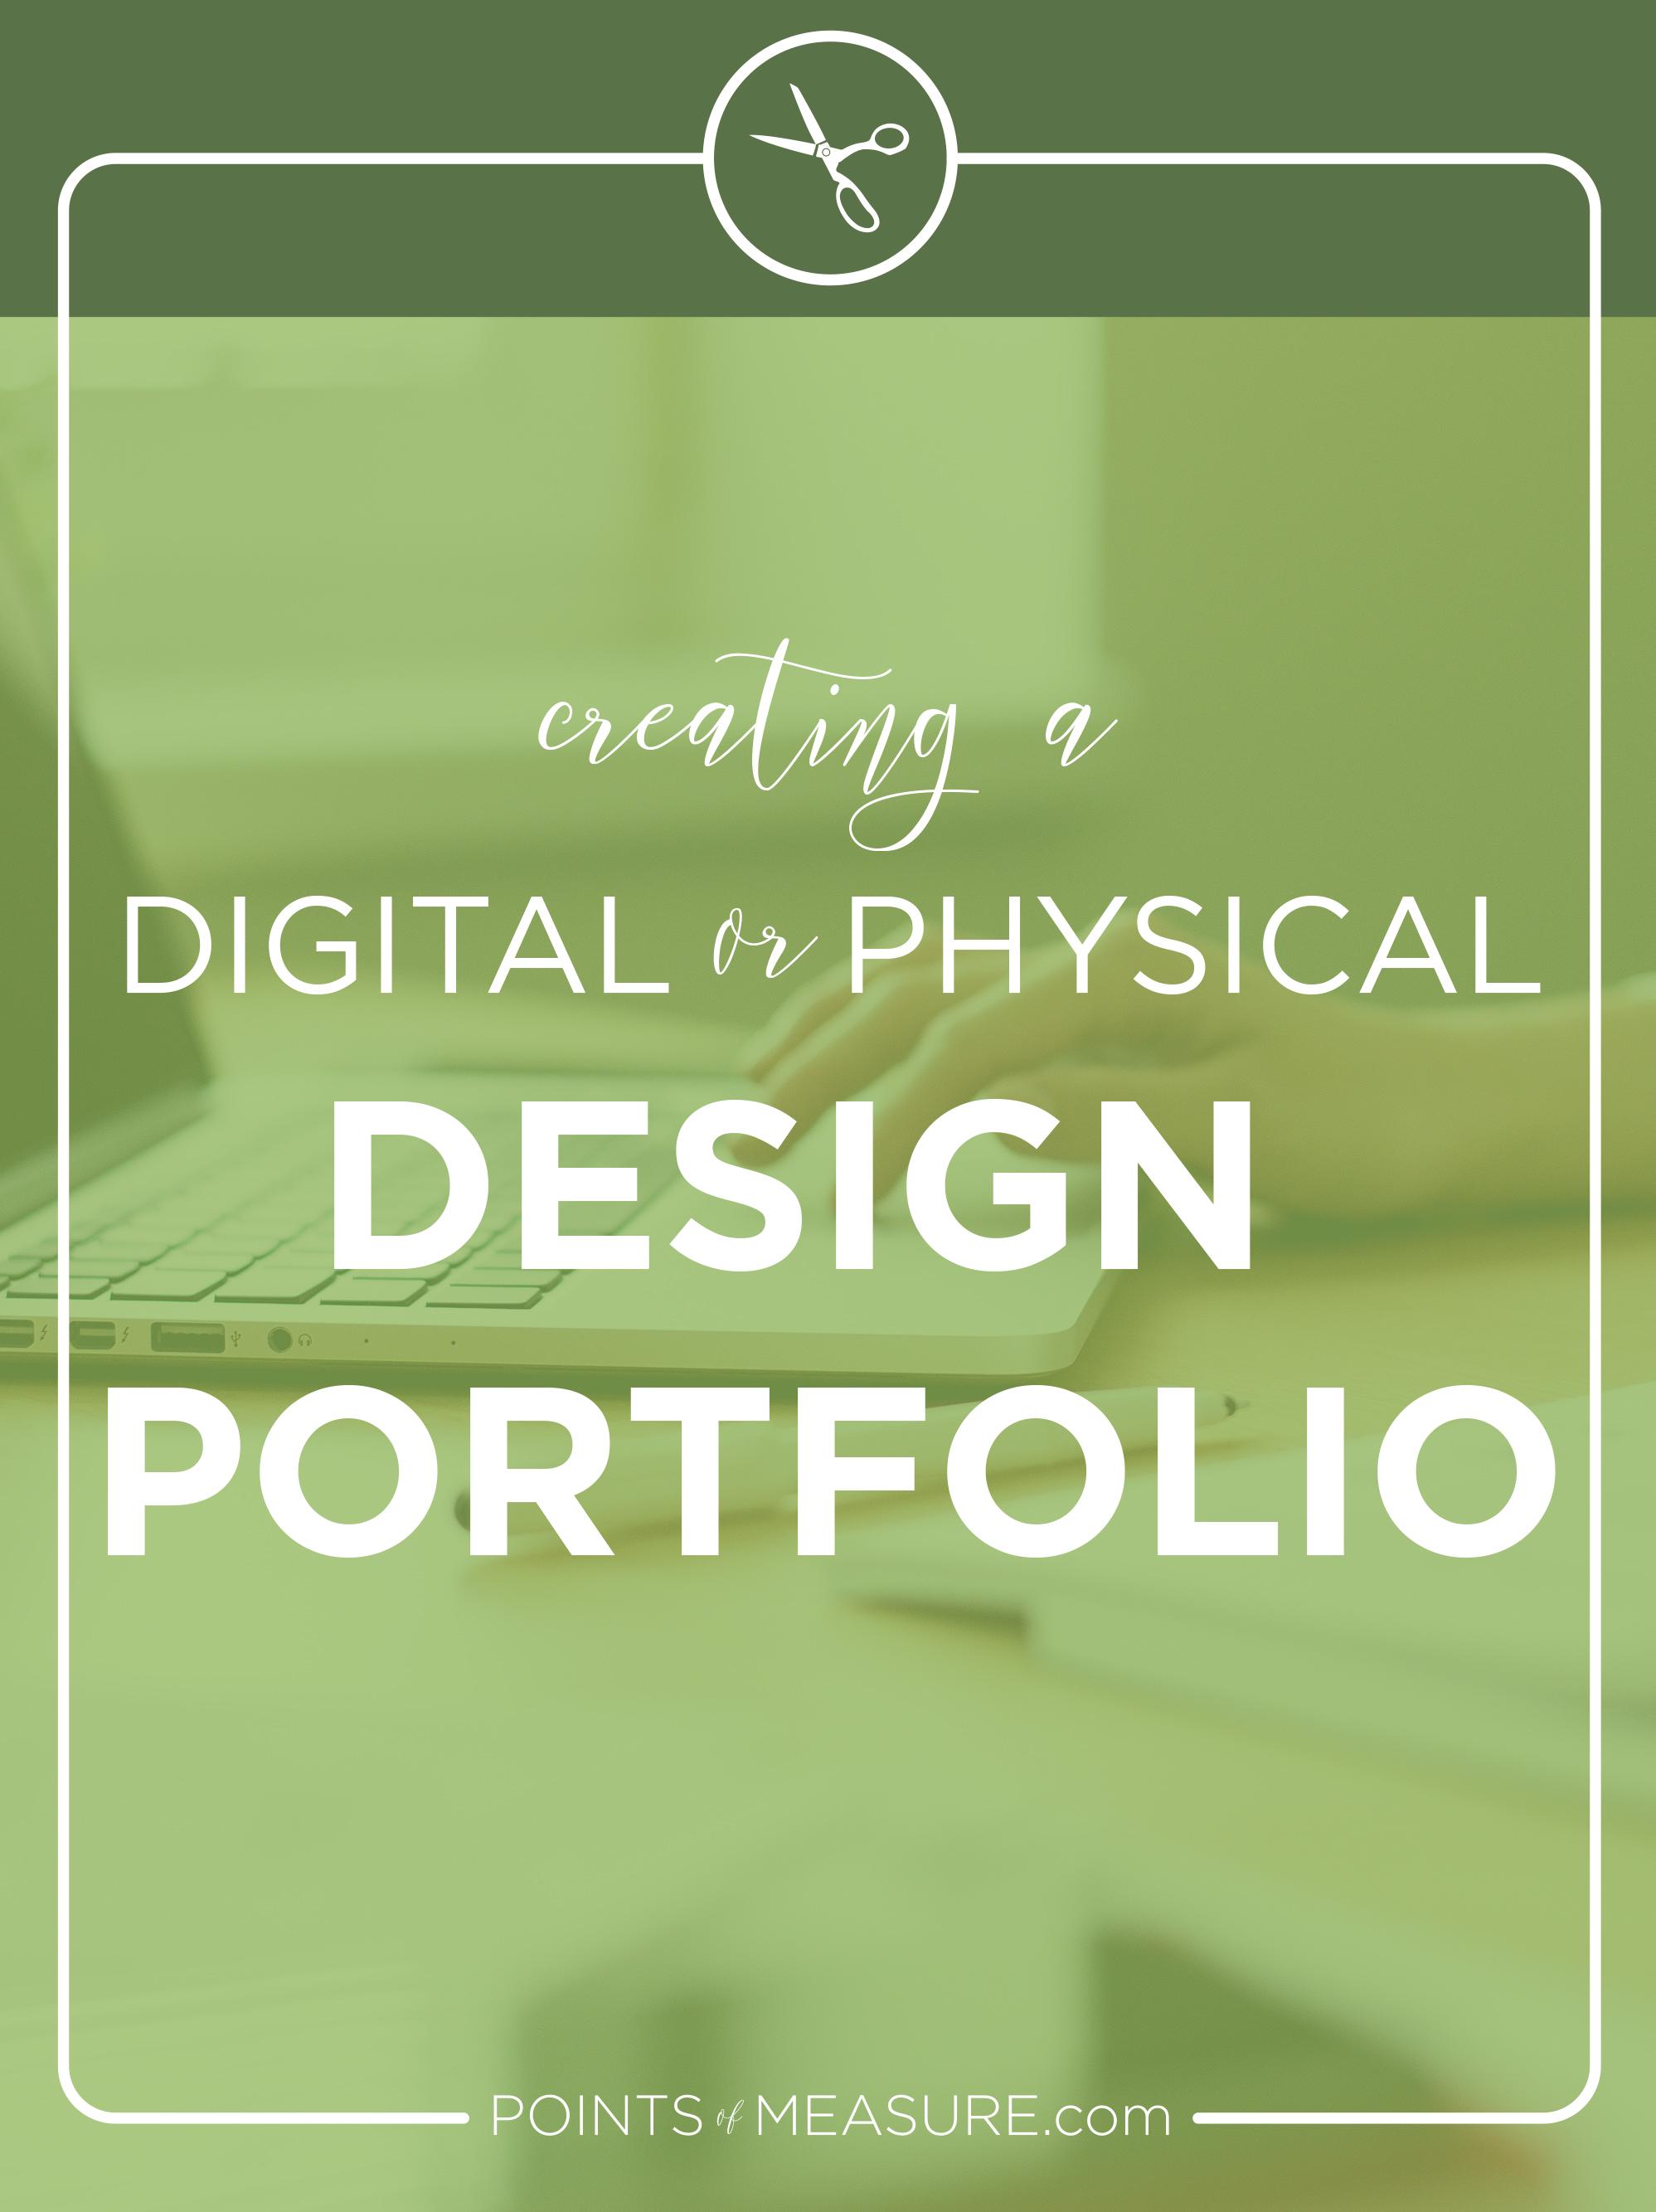 creating-a-digital-or-physical-design-portfolio-points-of-measure.jpg